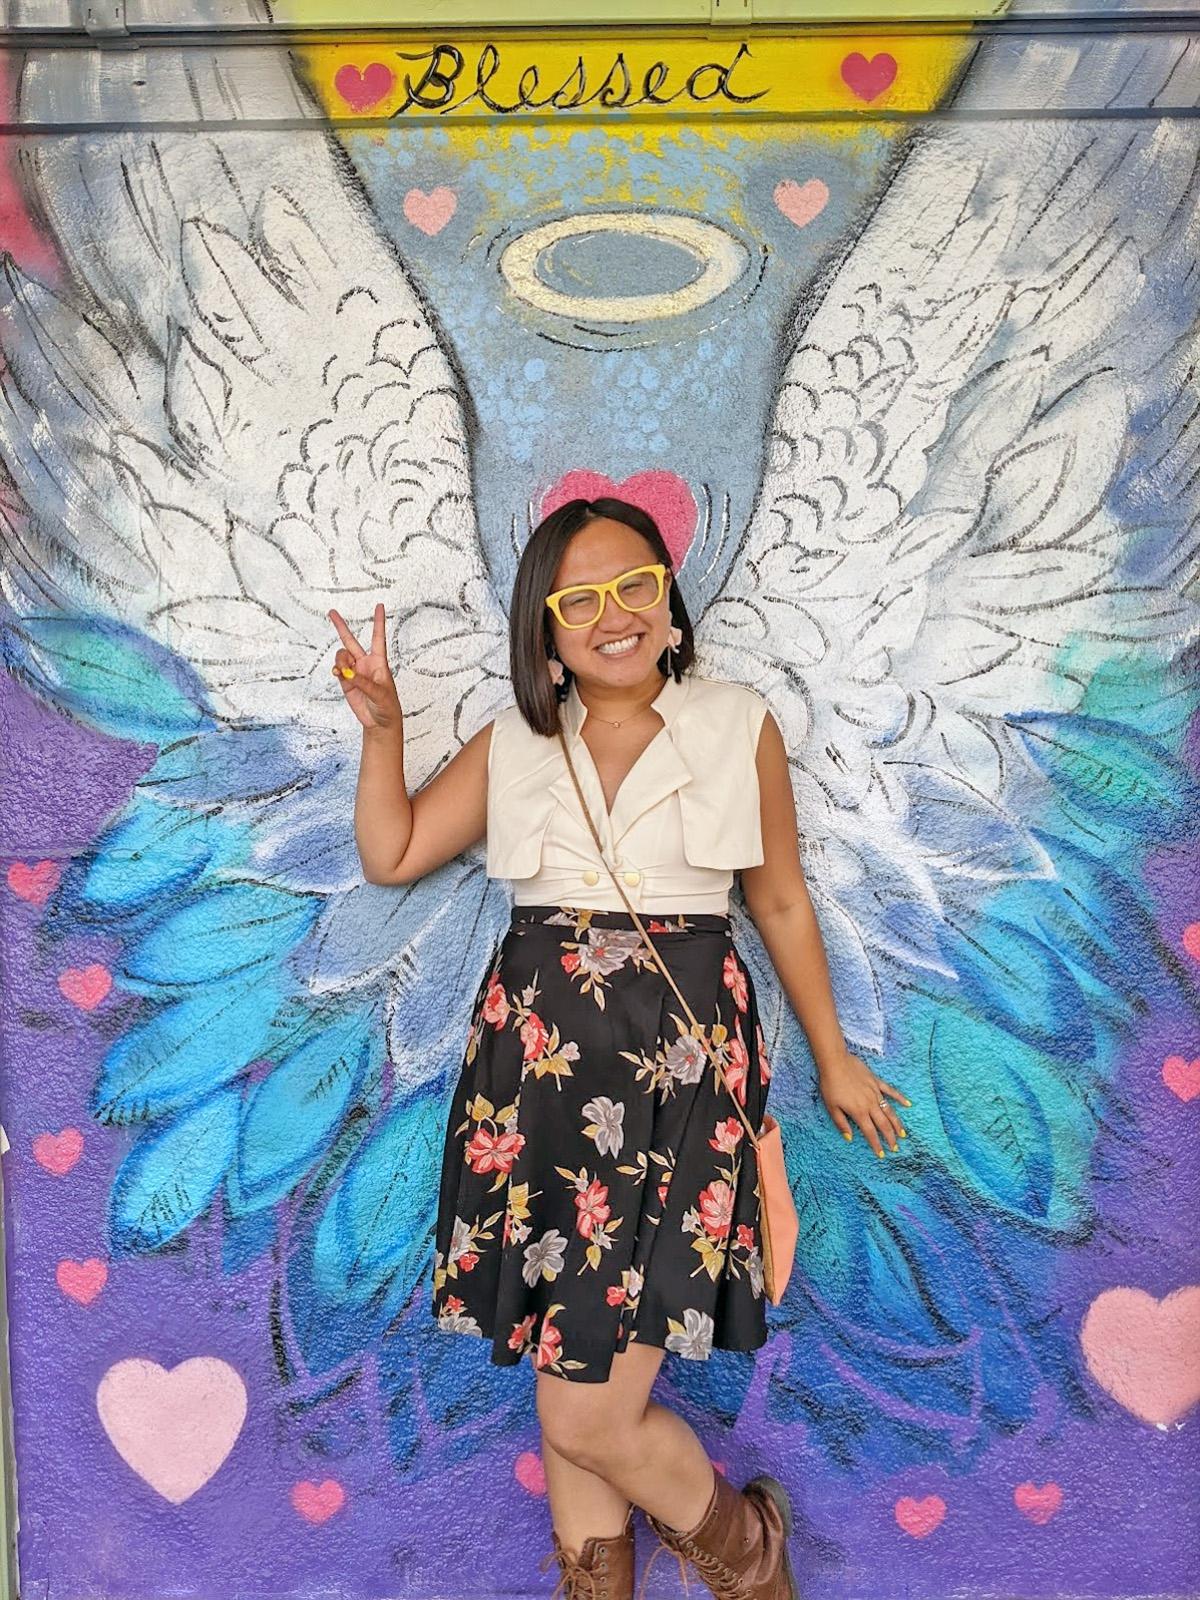 Instagrammable Walls of Edmonton - Explore Edmonton - Murals - Walls - Whyte Ave Old Strathcona - Clairitea Angel Wings